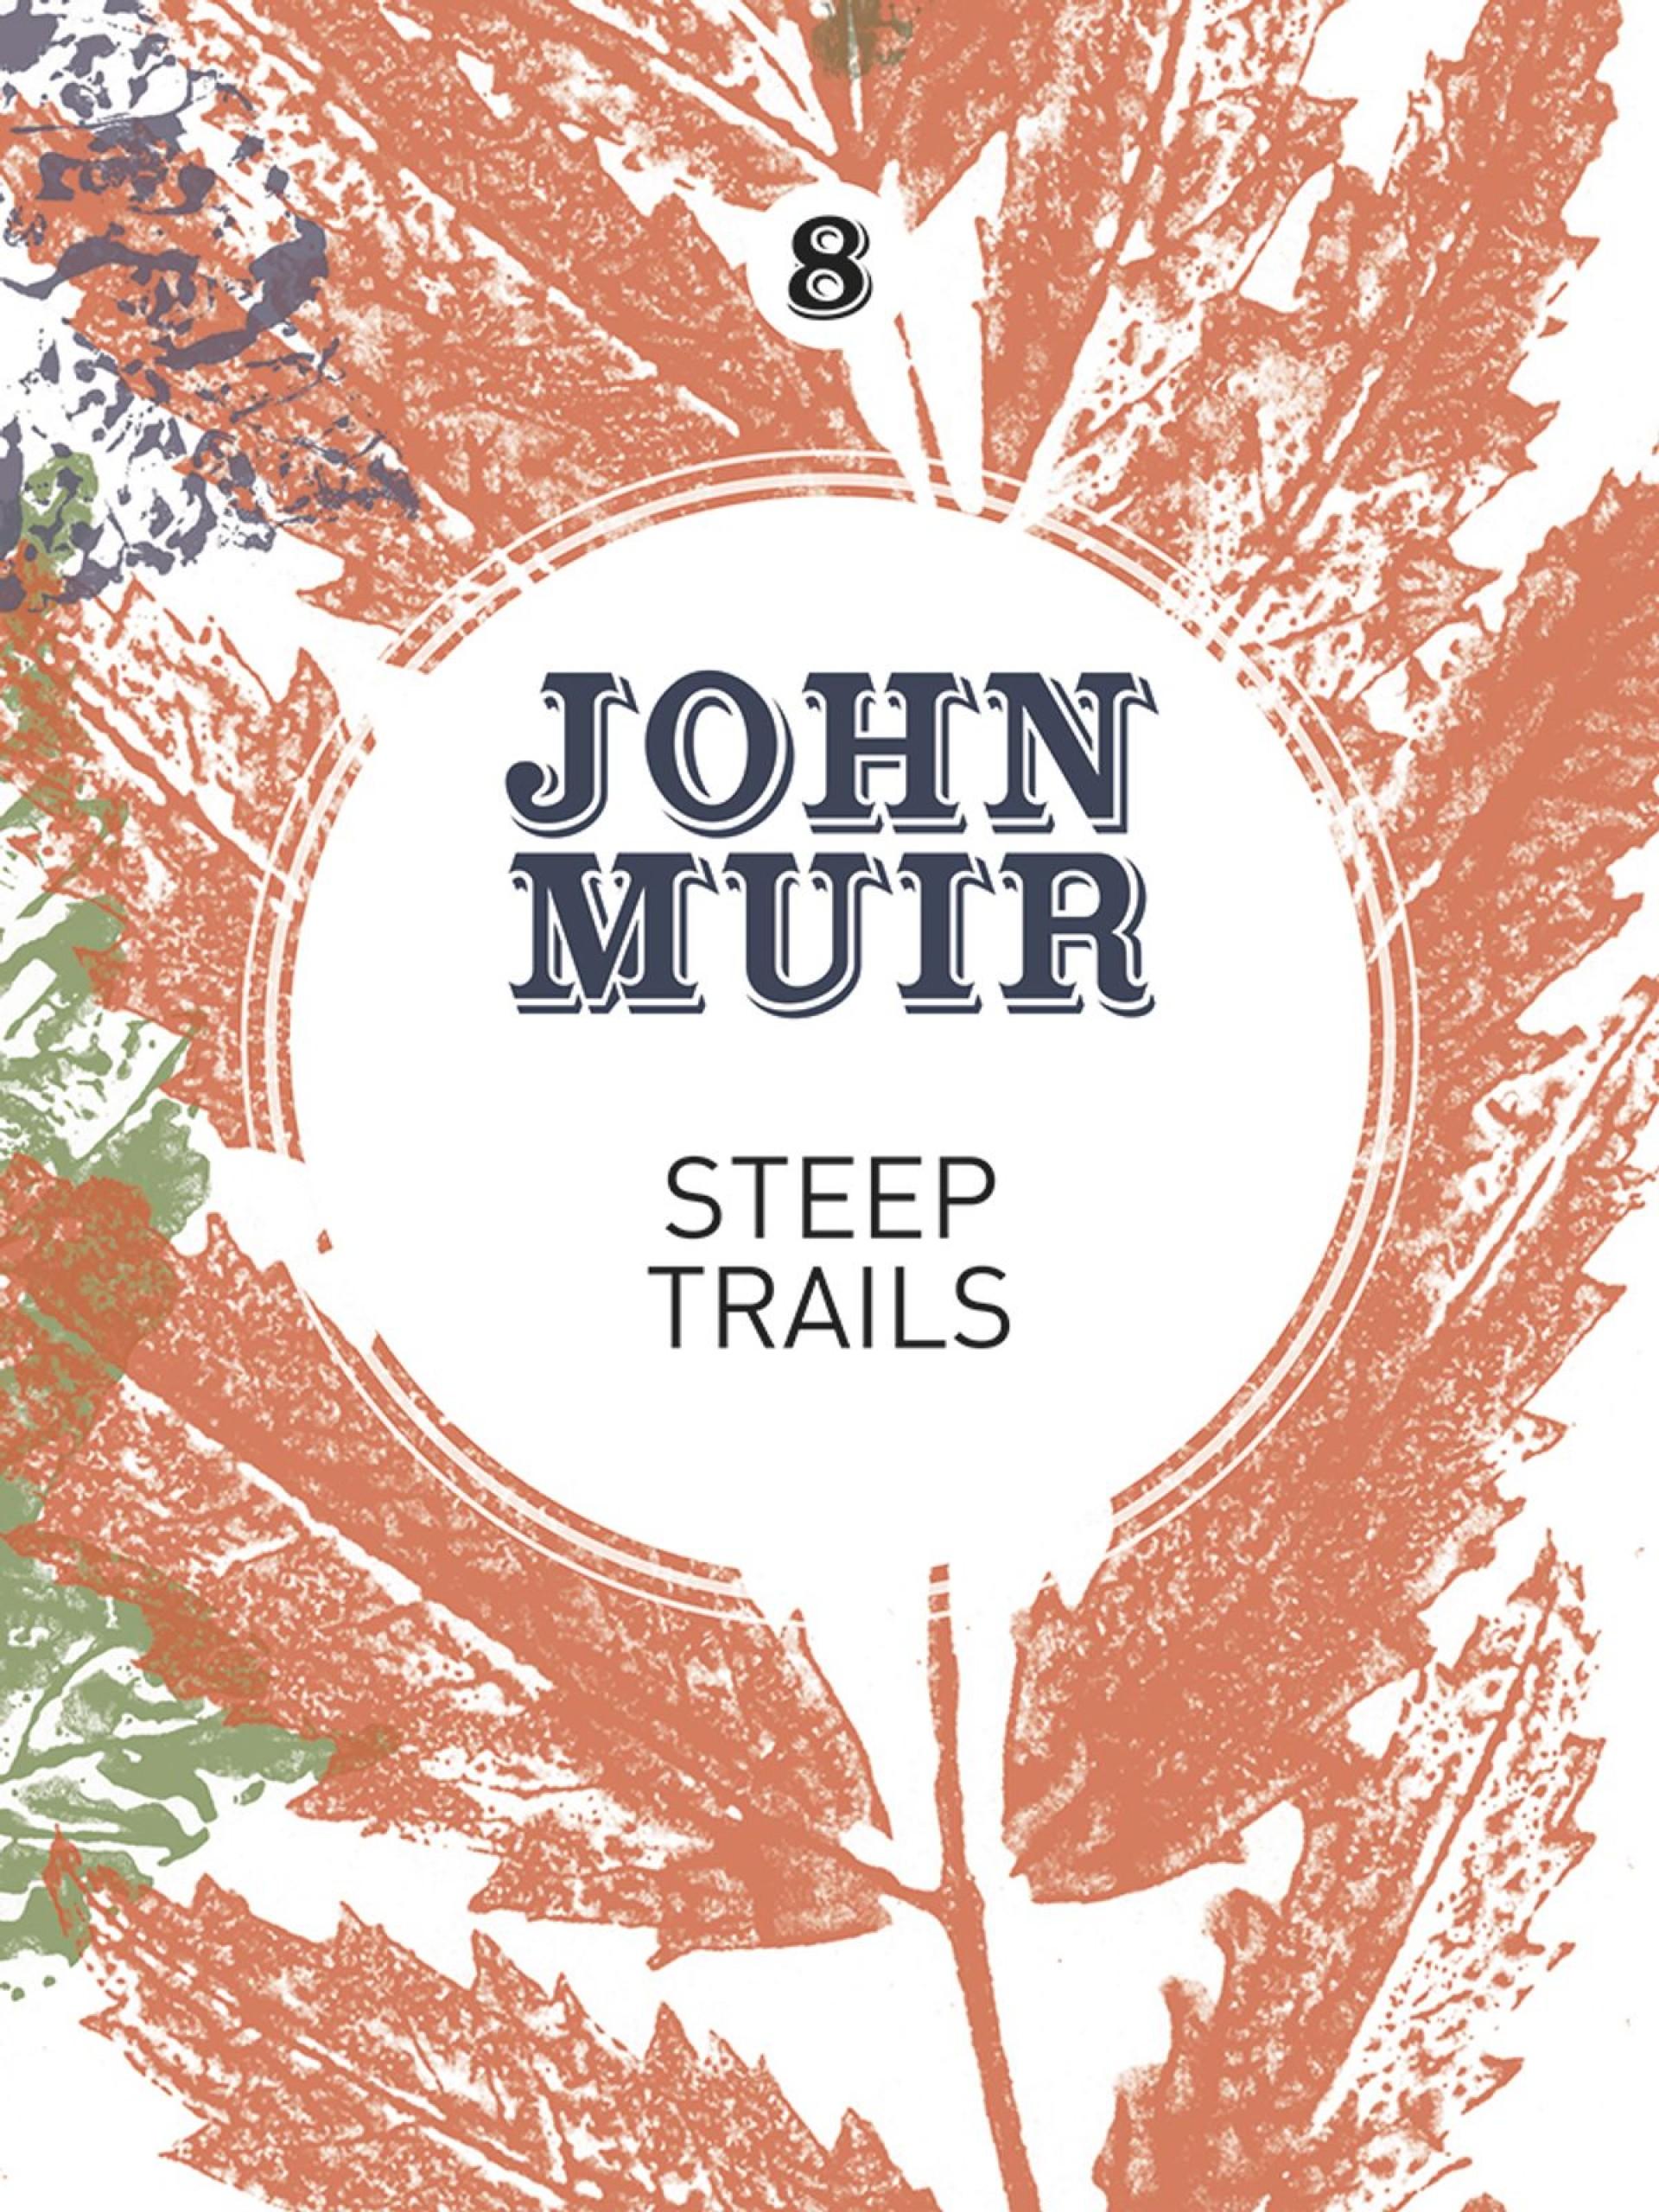 021 Essay Example John Muir Wilderness Essays Steep Trails Best Pdf Review 1920